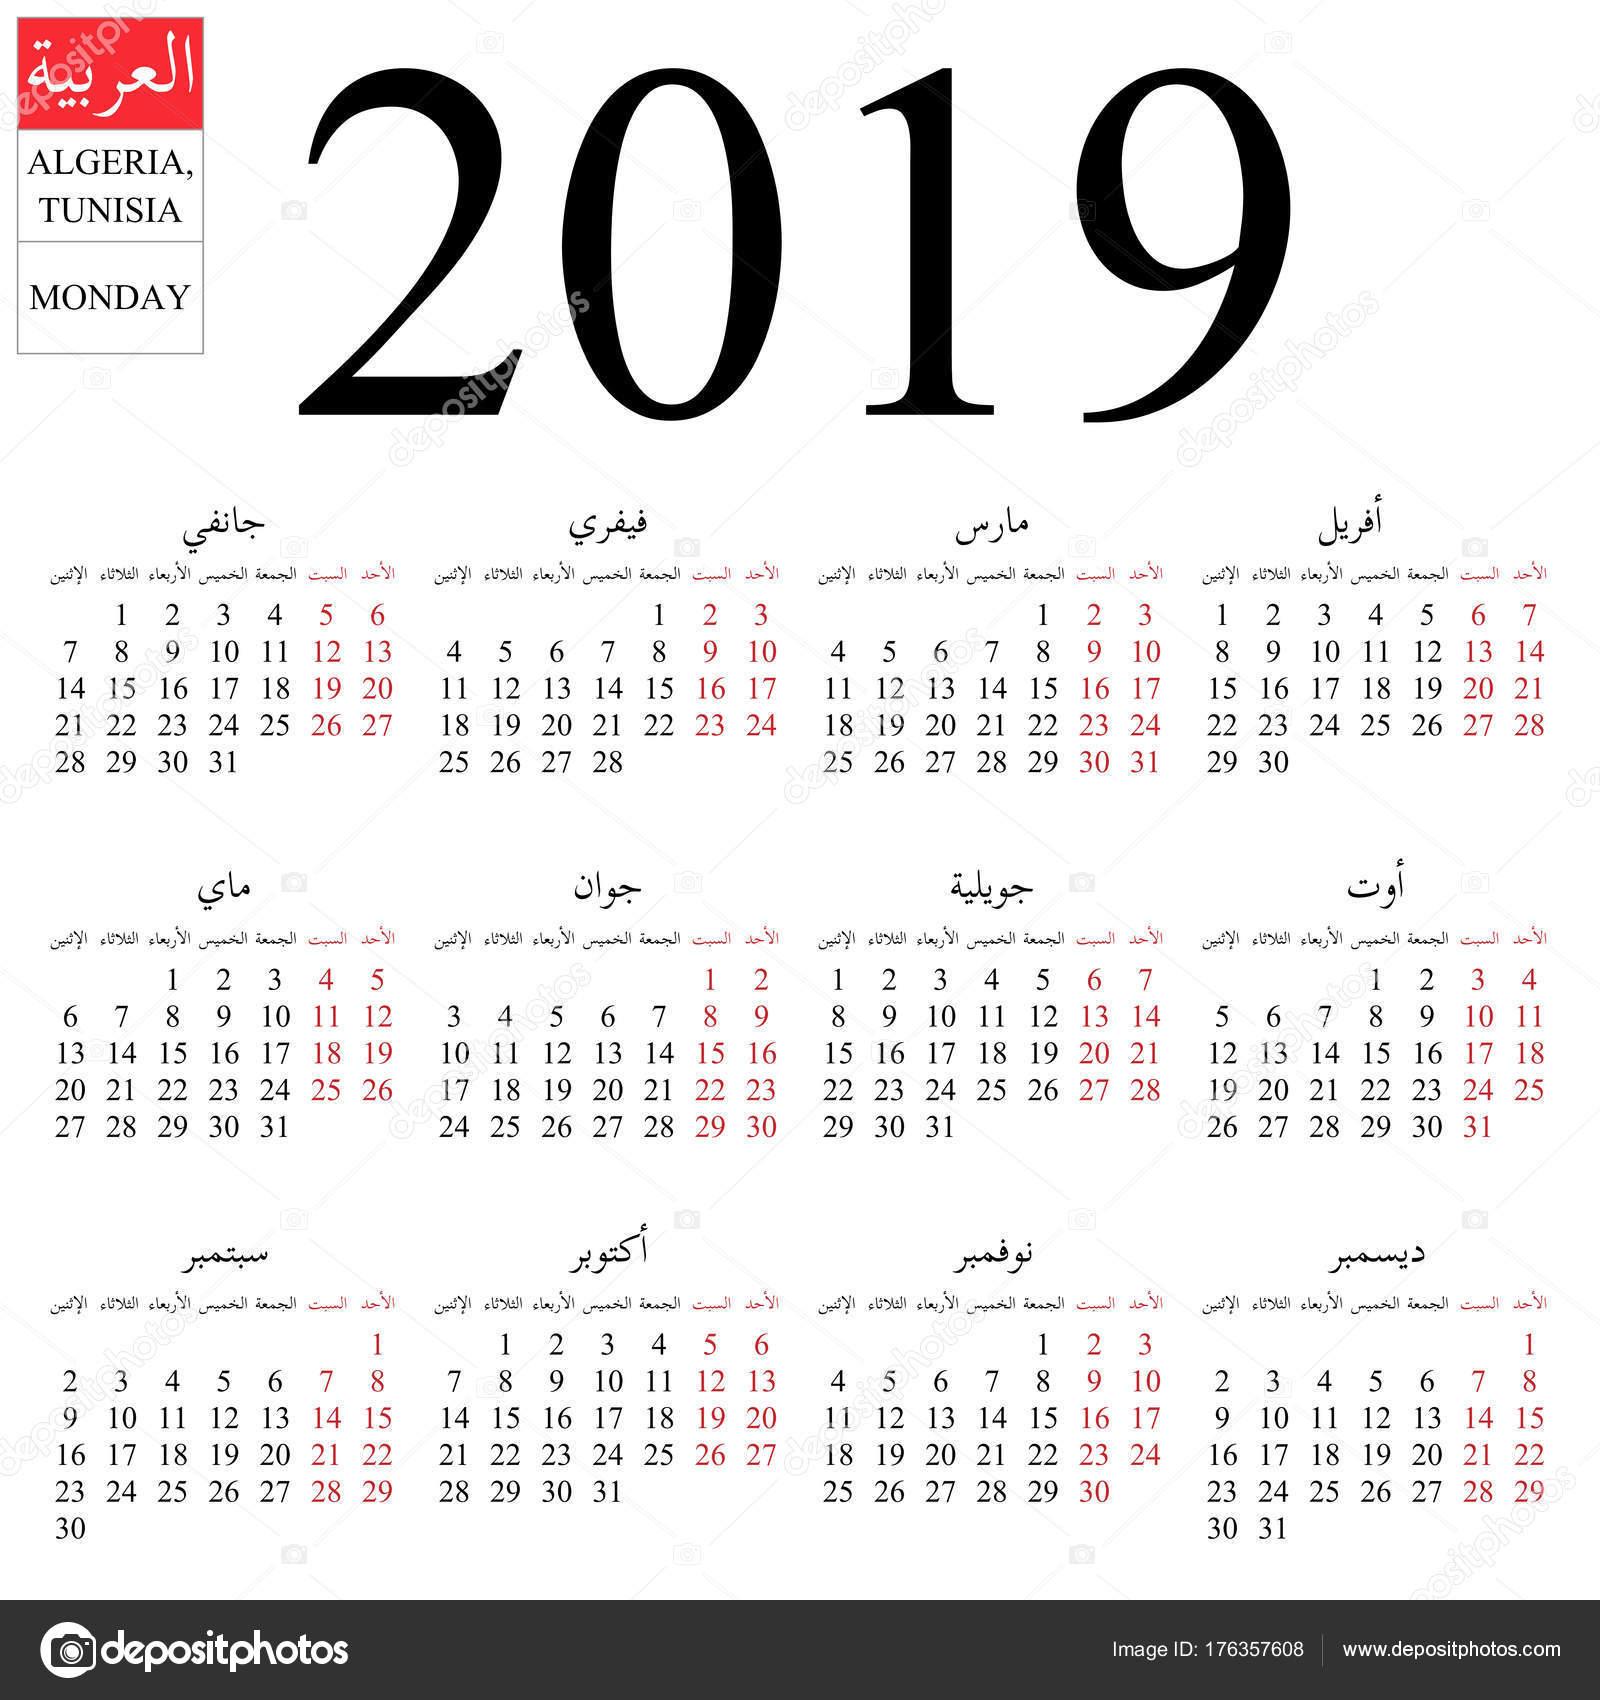 2019 naptár nevekkel Naptár 2019, Arab, hétfő — Stock Vektor © Dmitry_Guzhanin #176357608 2019 naptár nevekkel